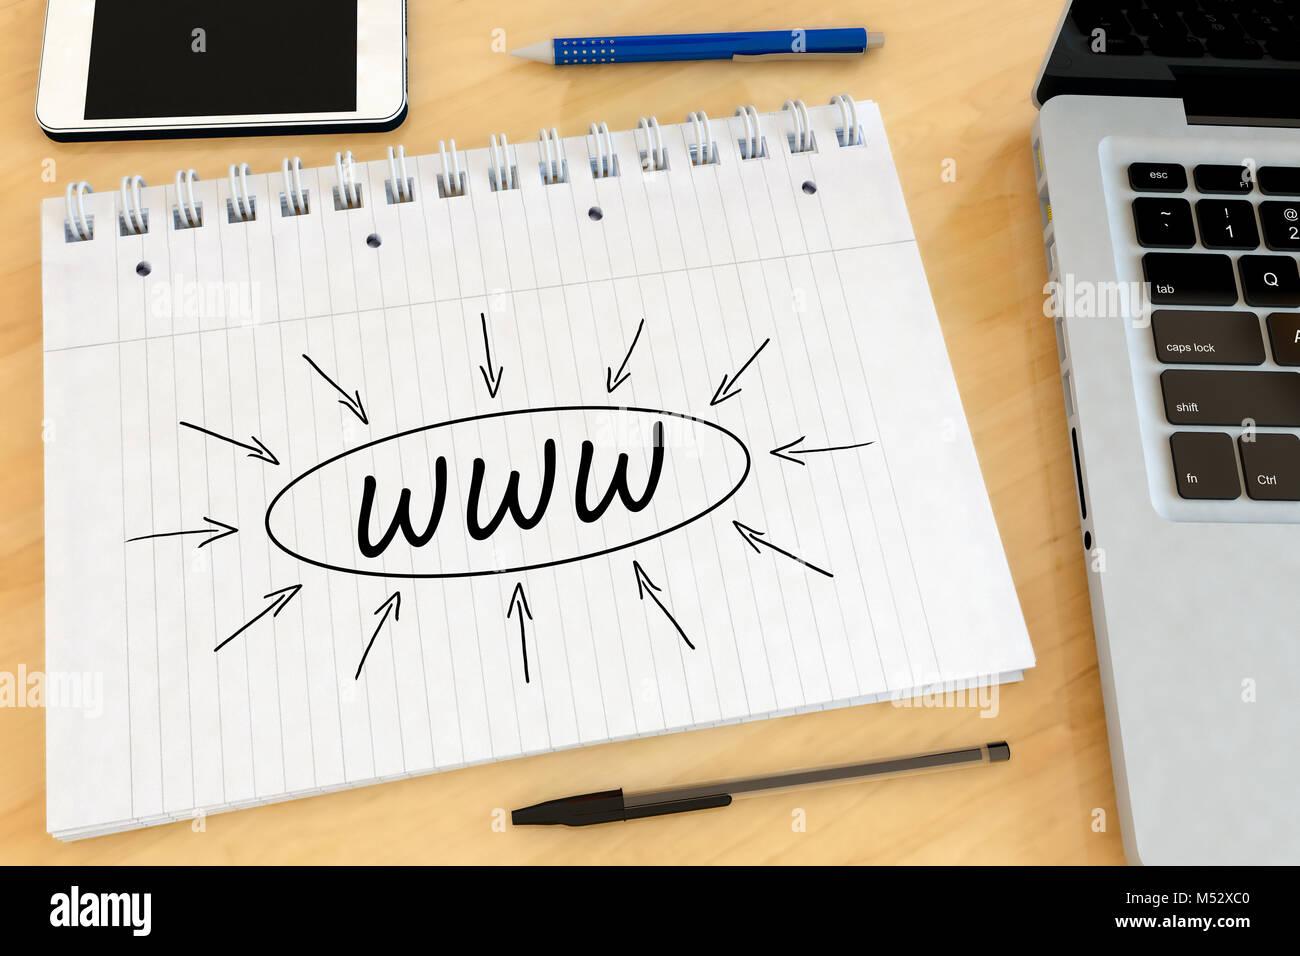 World Wide Web - Stock Image